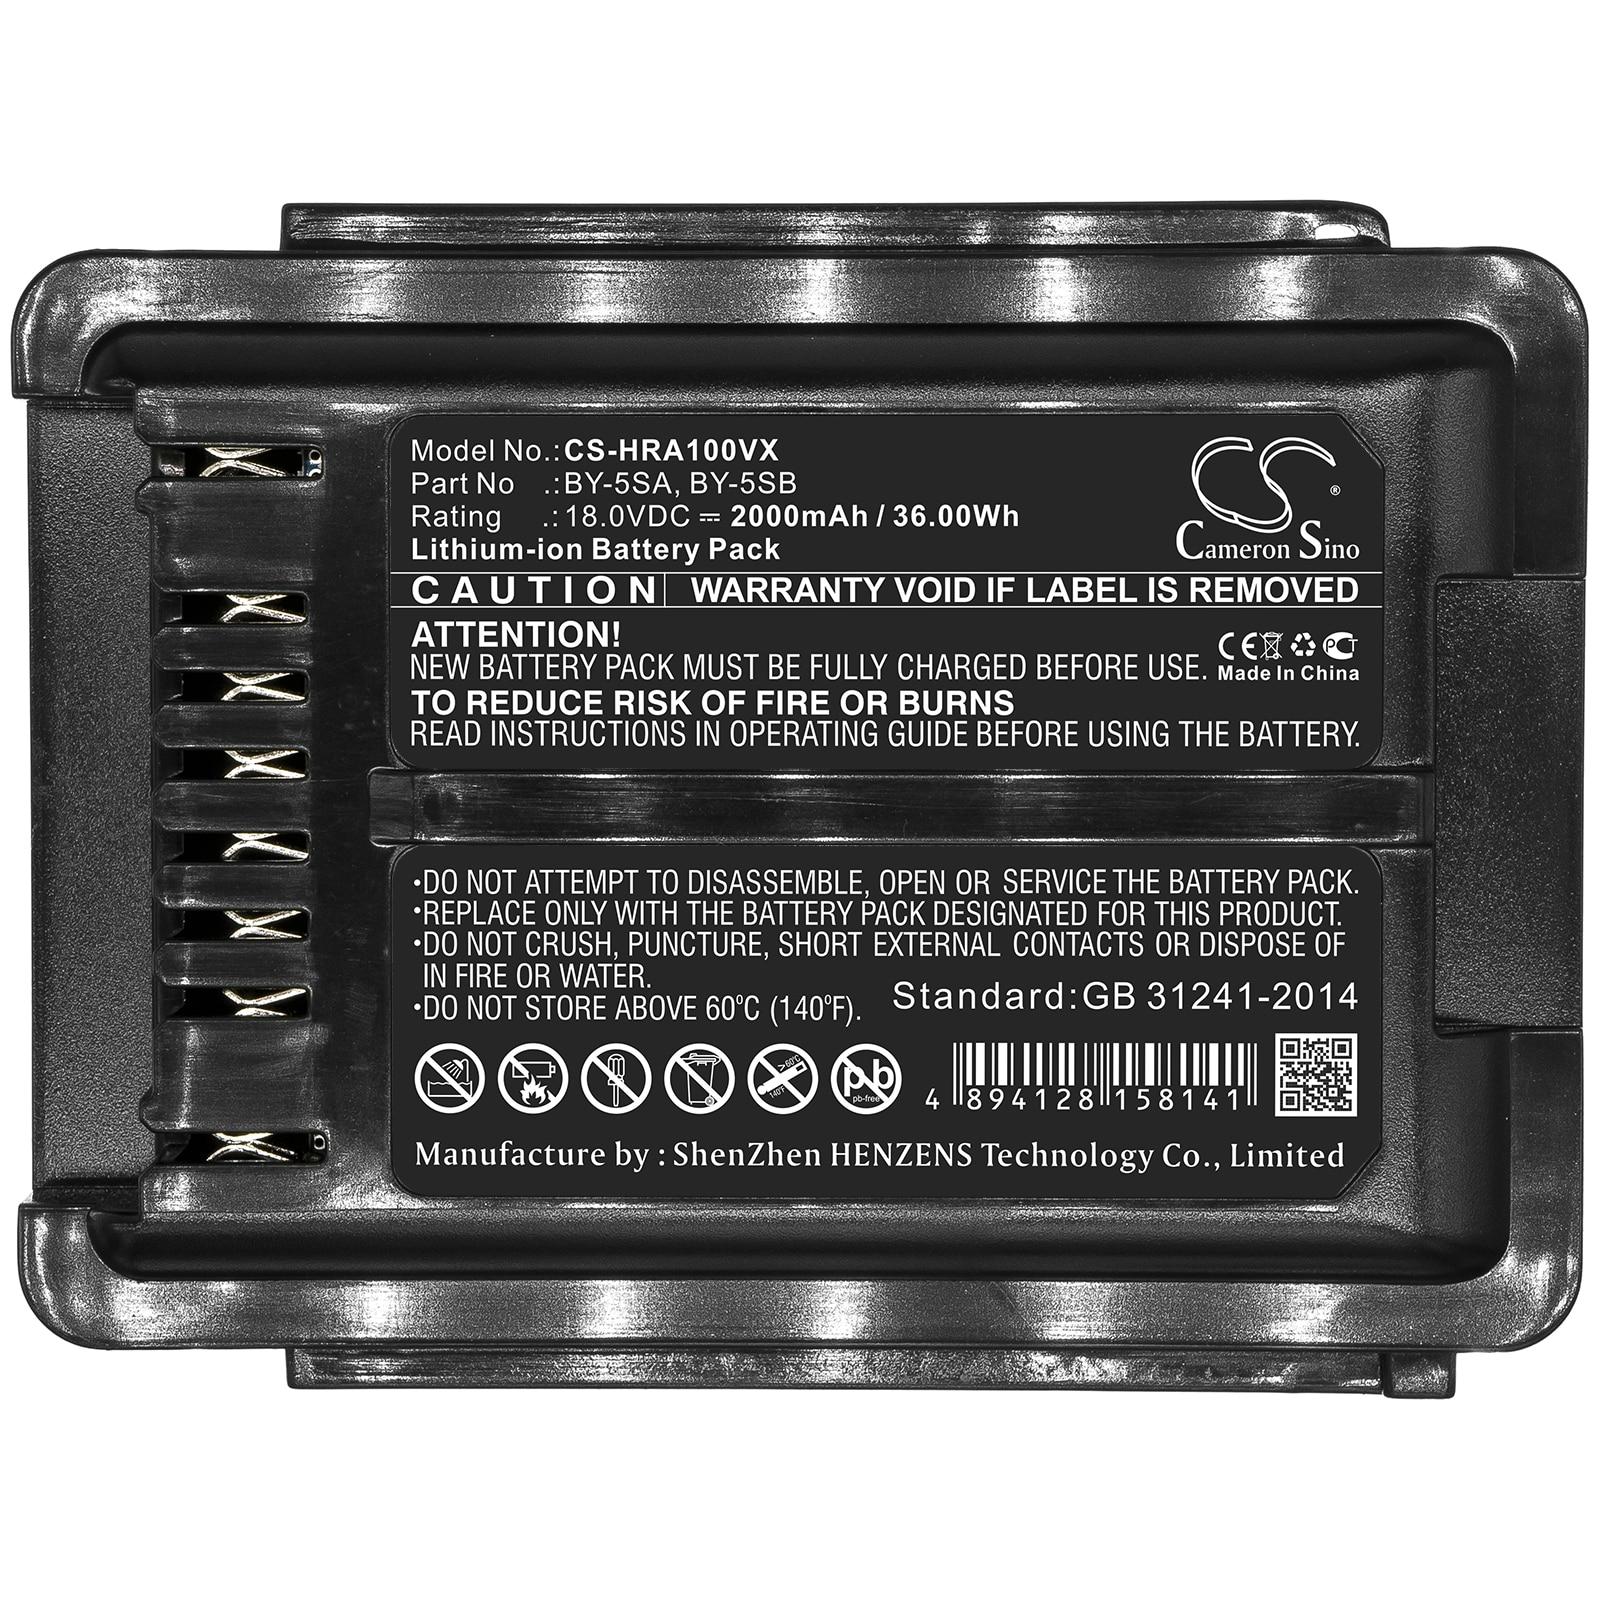 Generic بطارية 2000mA لشارب EC-SX200 ، EC-SX200-A ، EC-SX200-N ، EC-SX200-R ، EC-SX210 ، EC-SX210-A ، BY-5SA ، BY-5SB